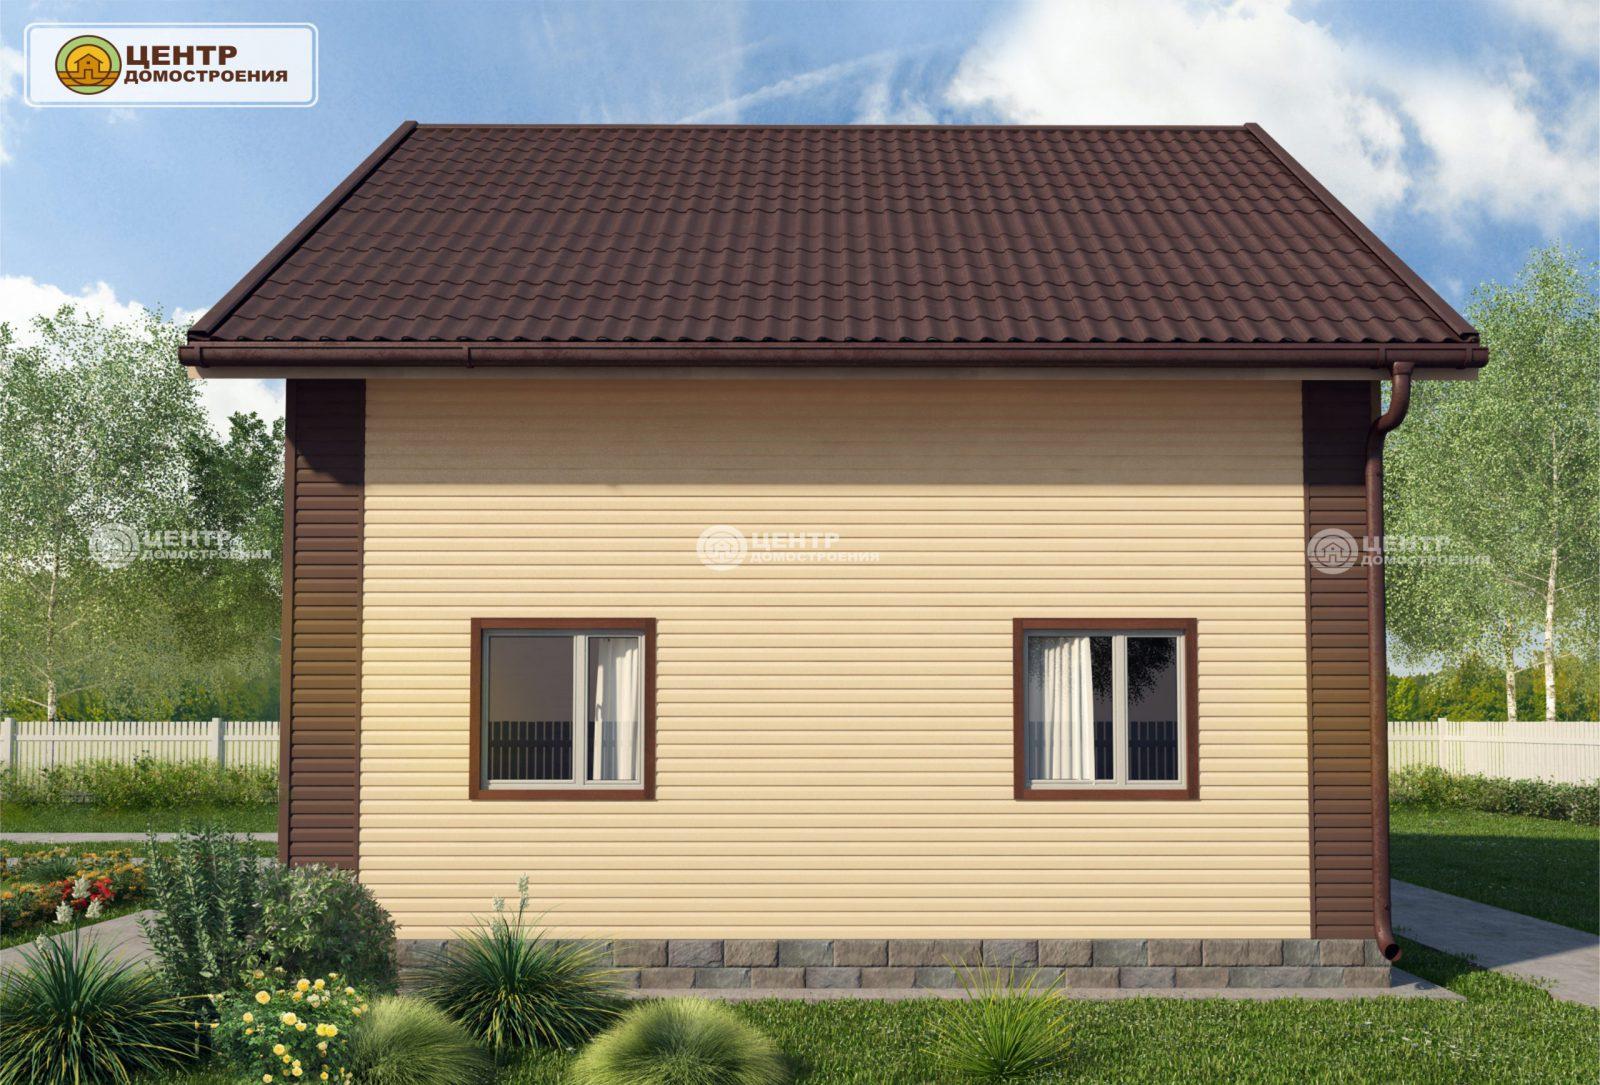 проект дома 8 на 8 с мансардой